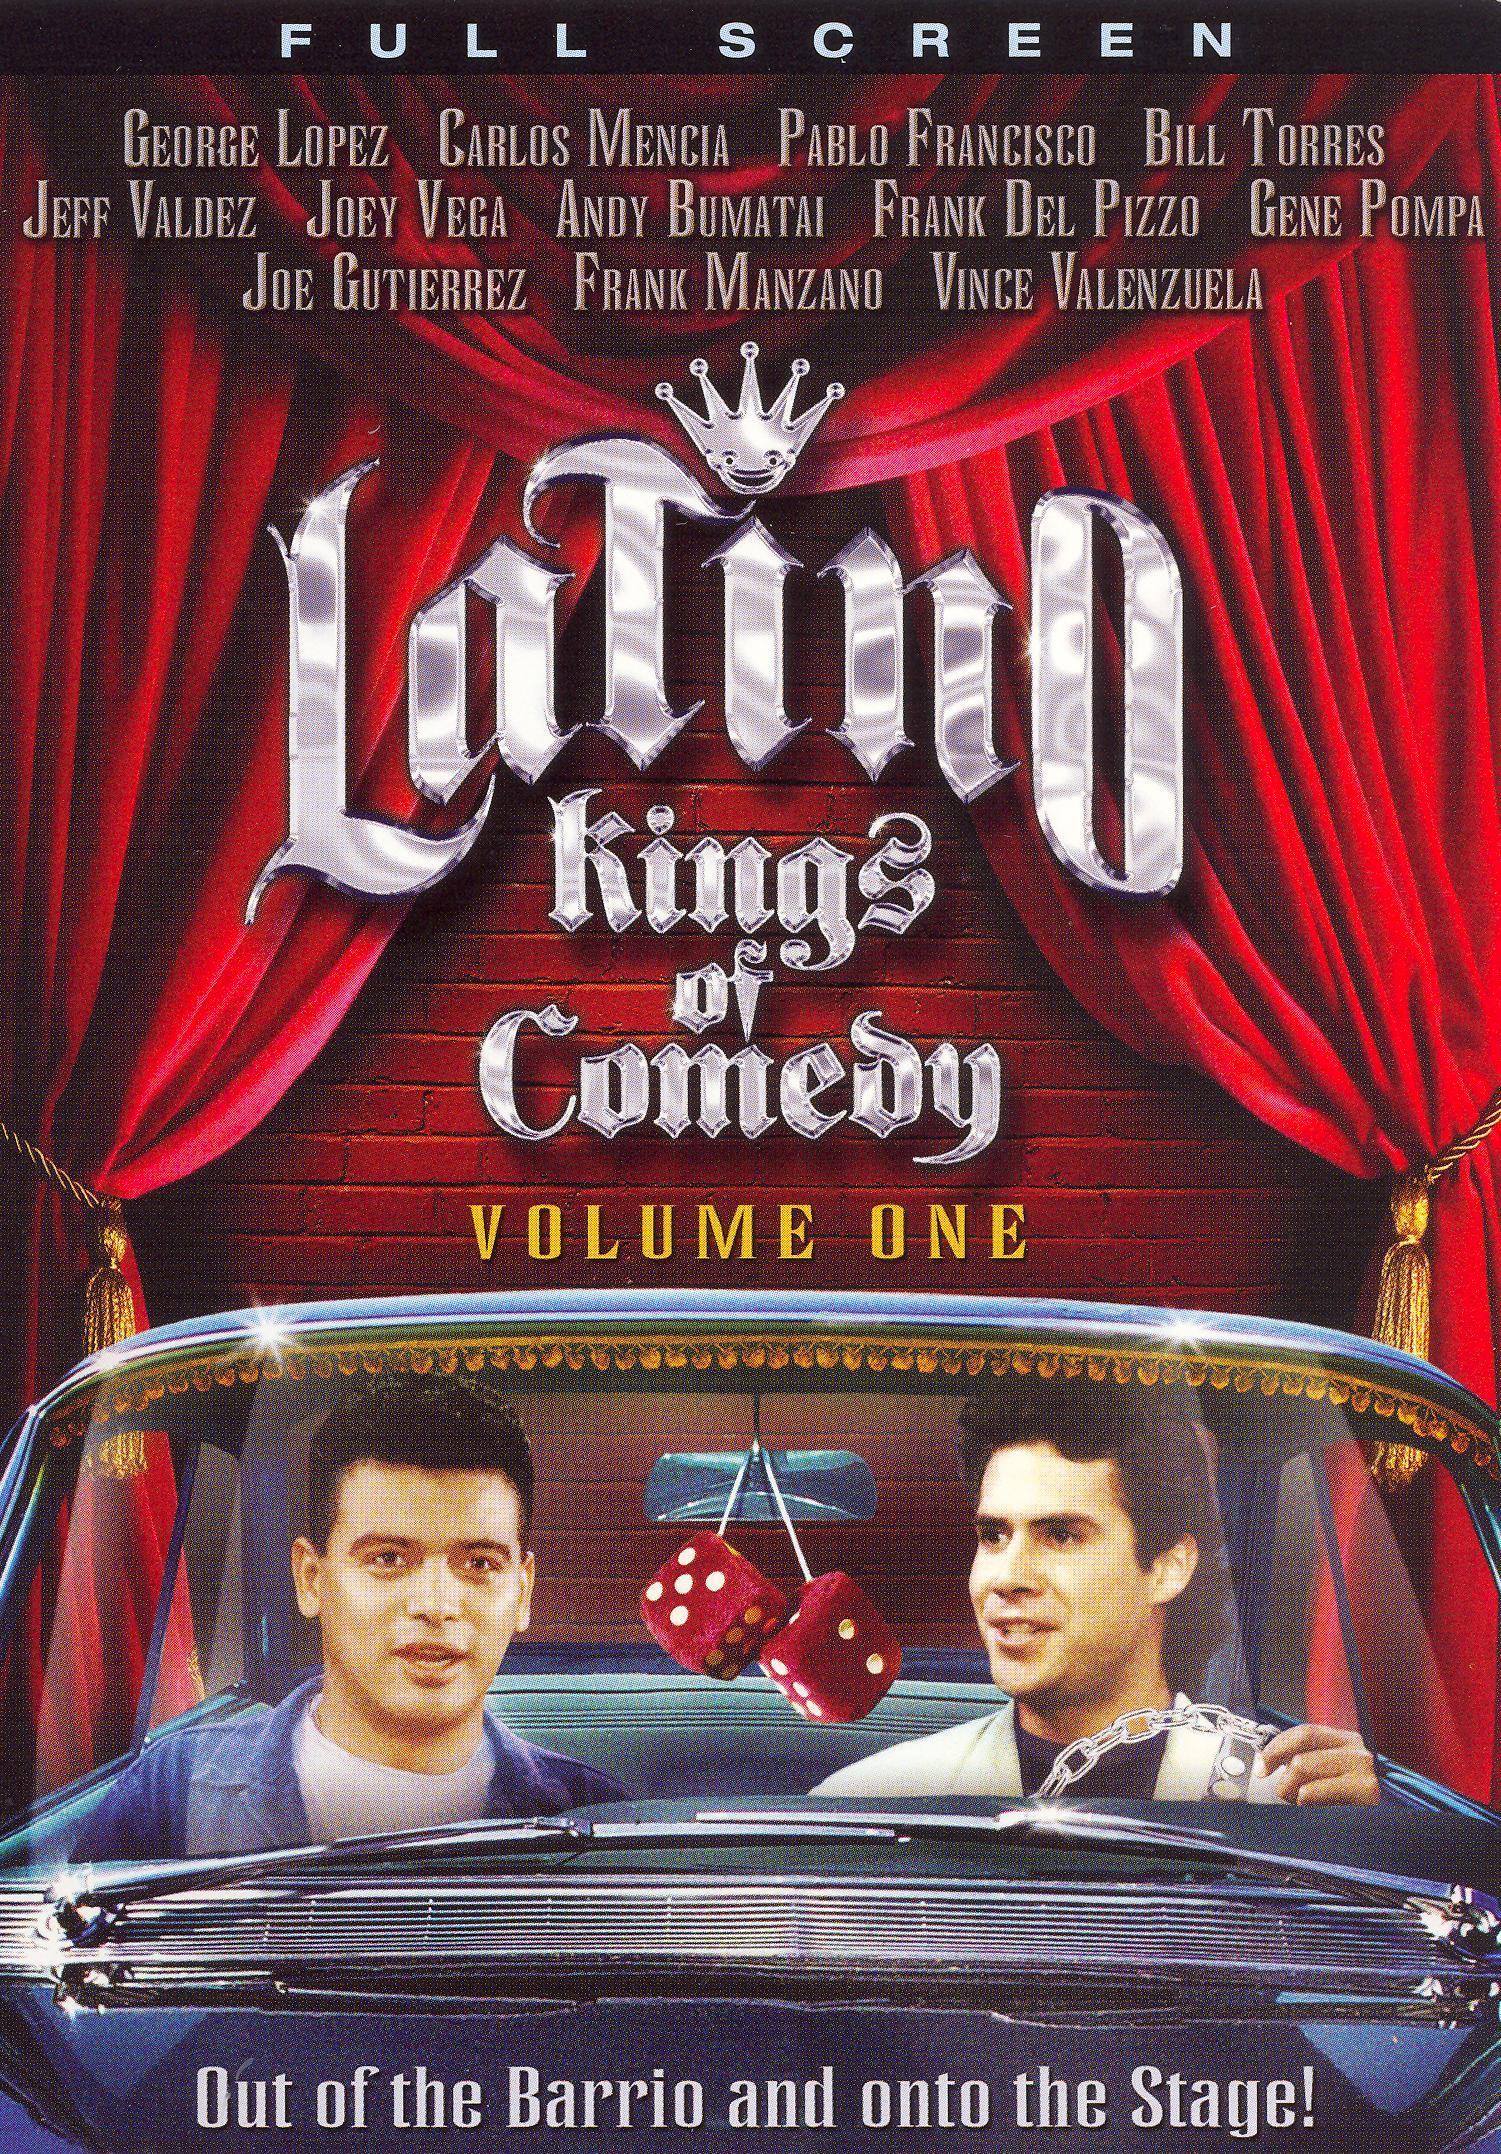 Latino Kings of Comedy, Vol. 1